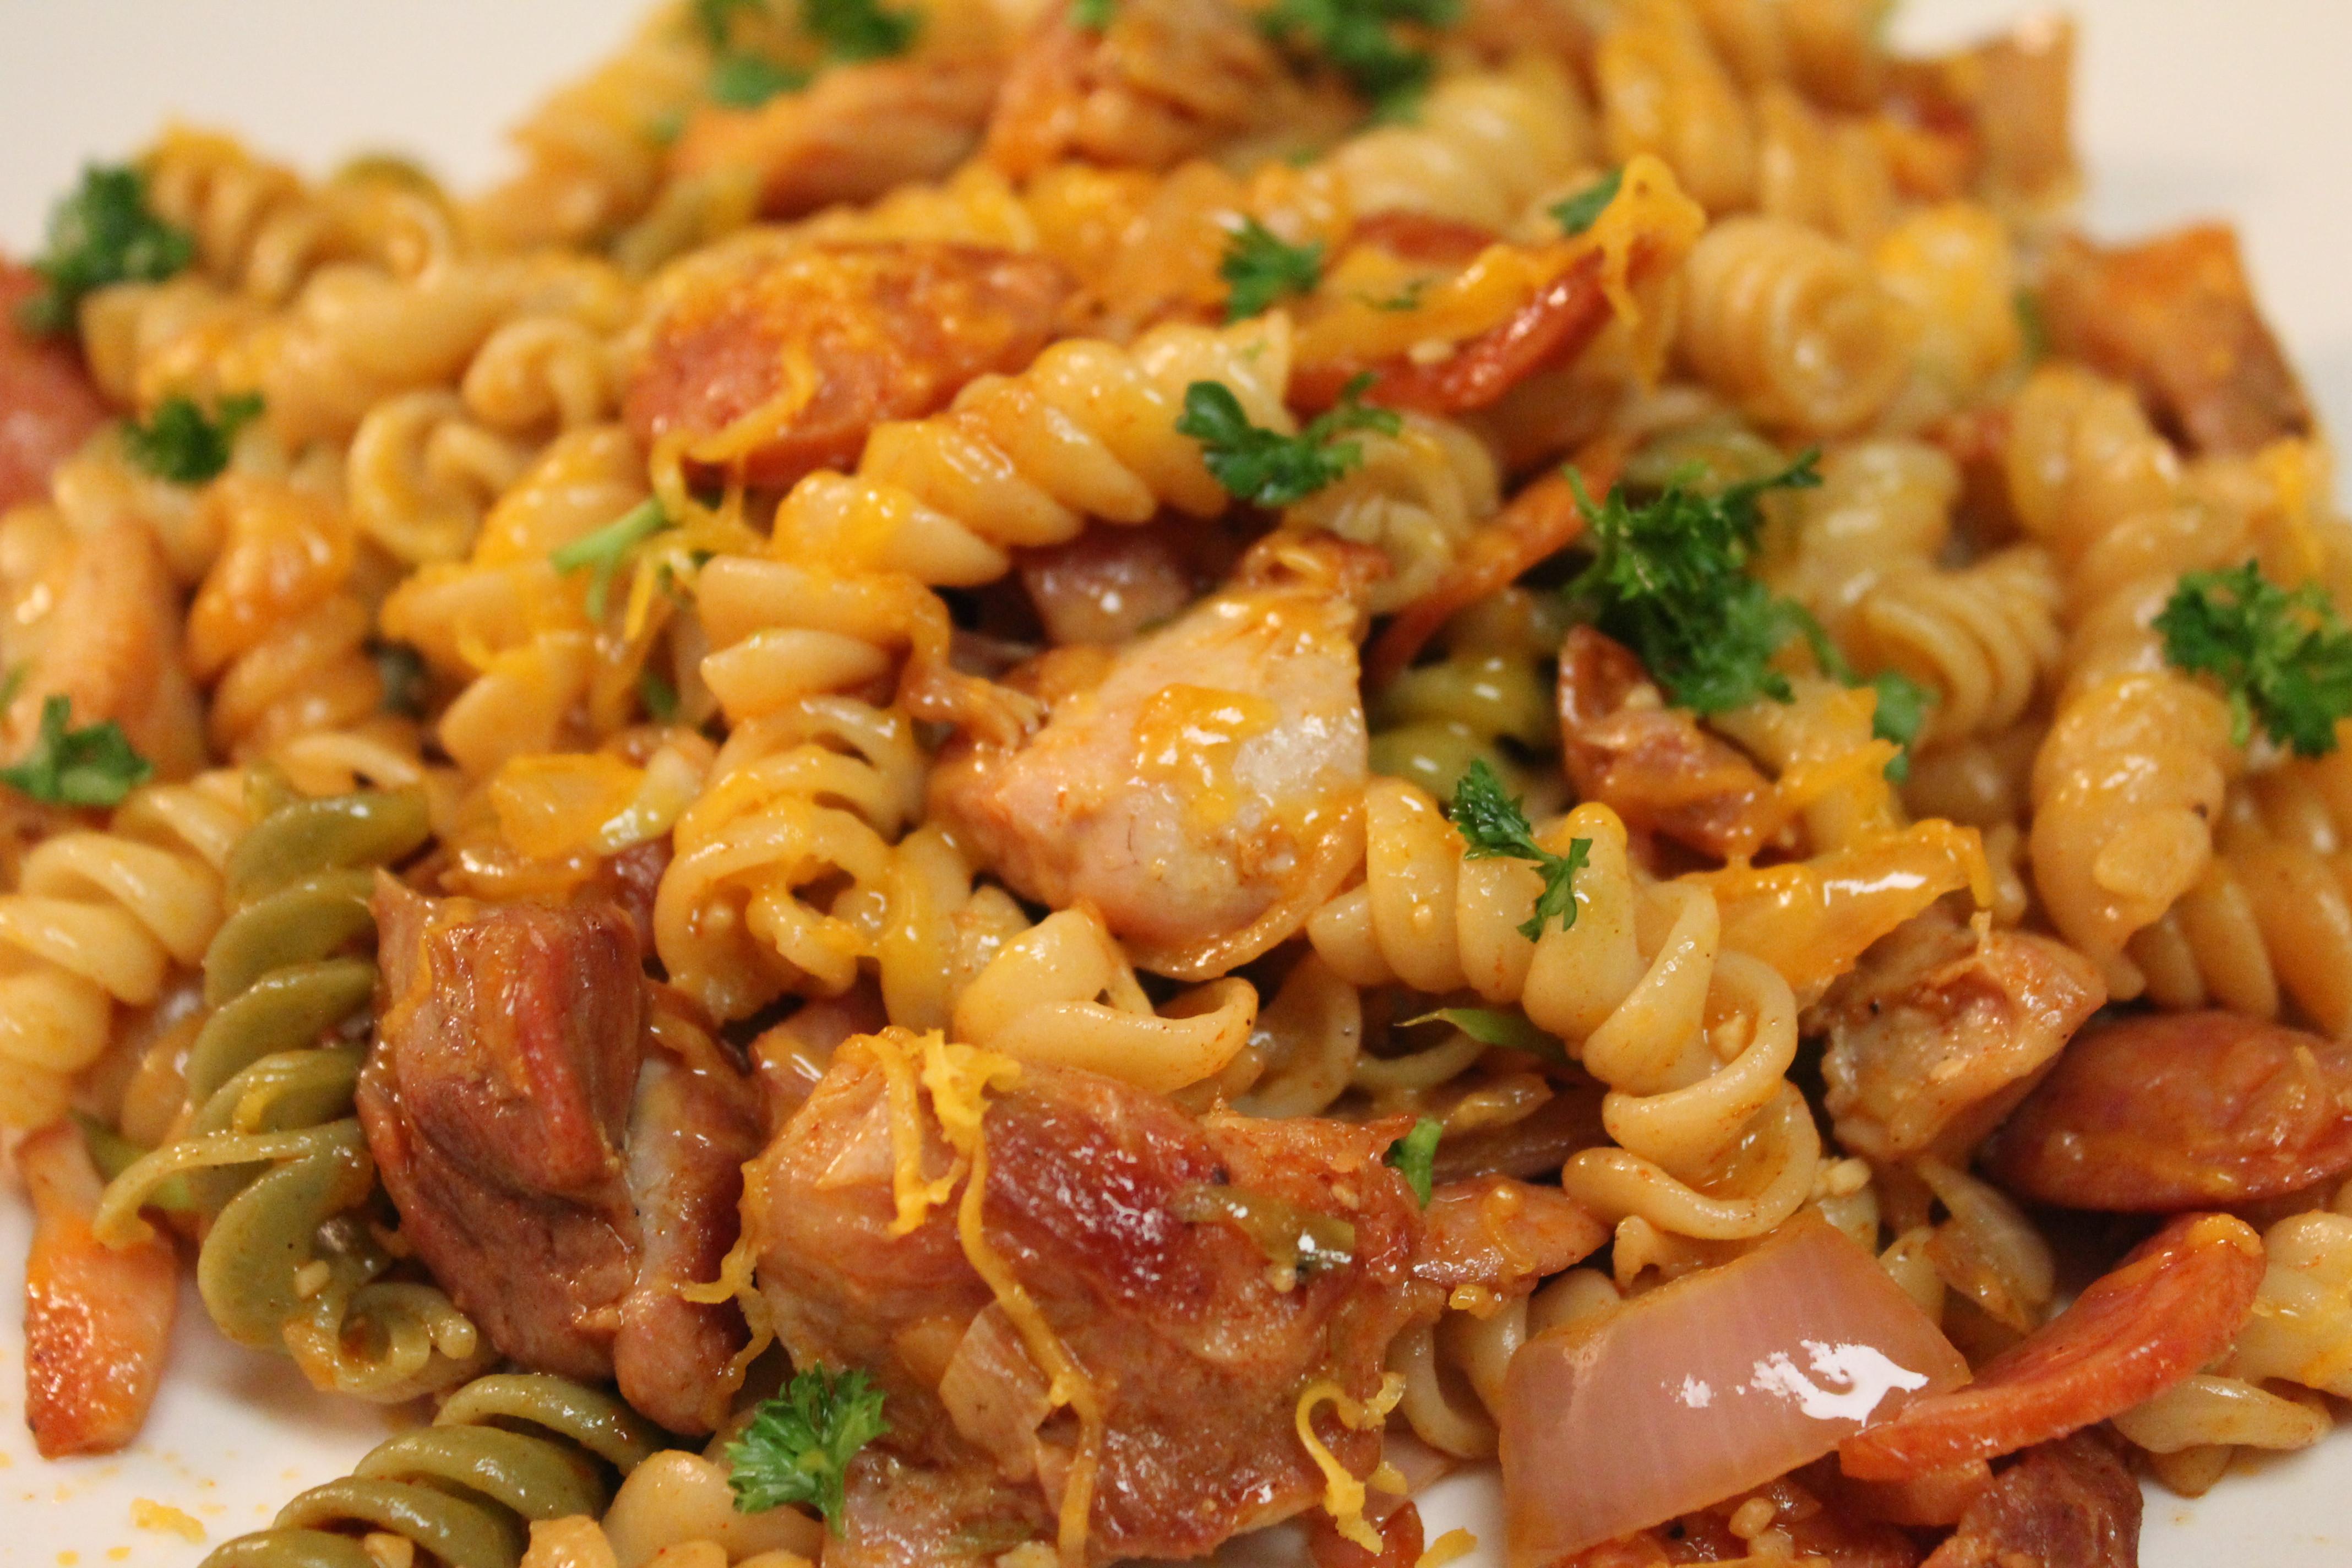 Chicken And Sausage Recipes  Cajun Chicken and Sausage Pasta